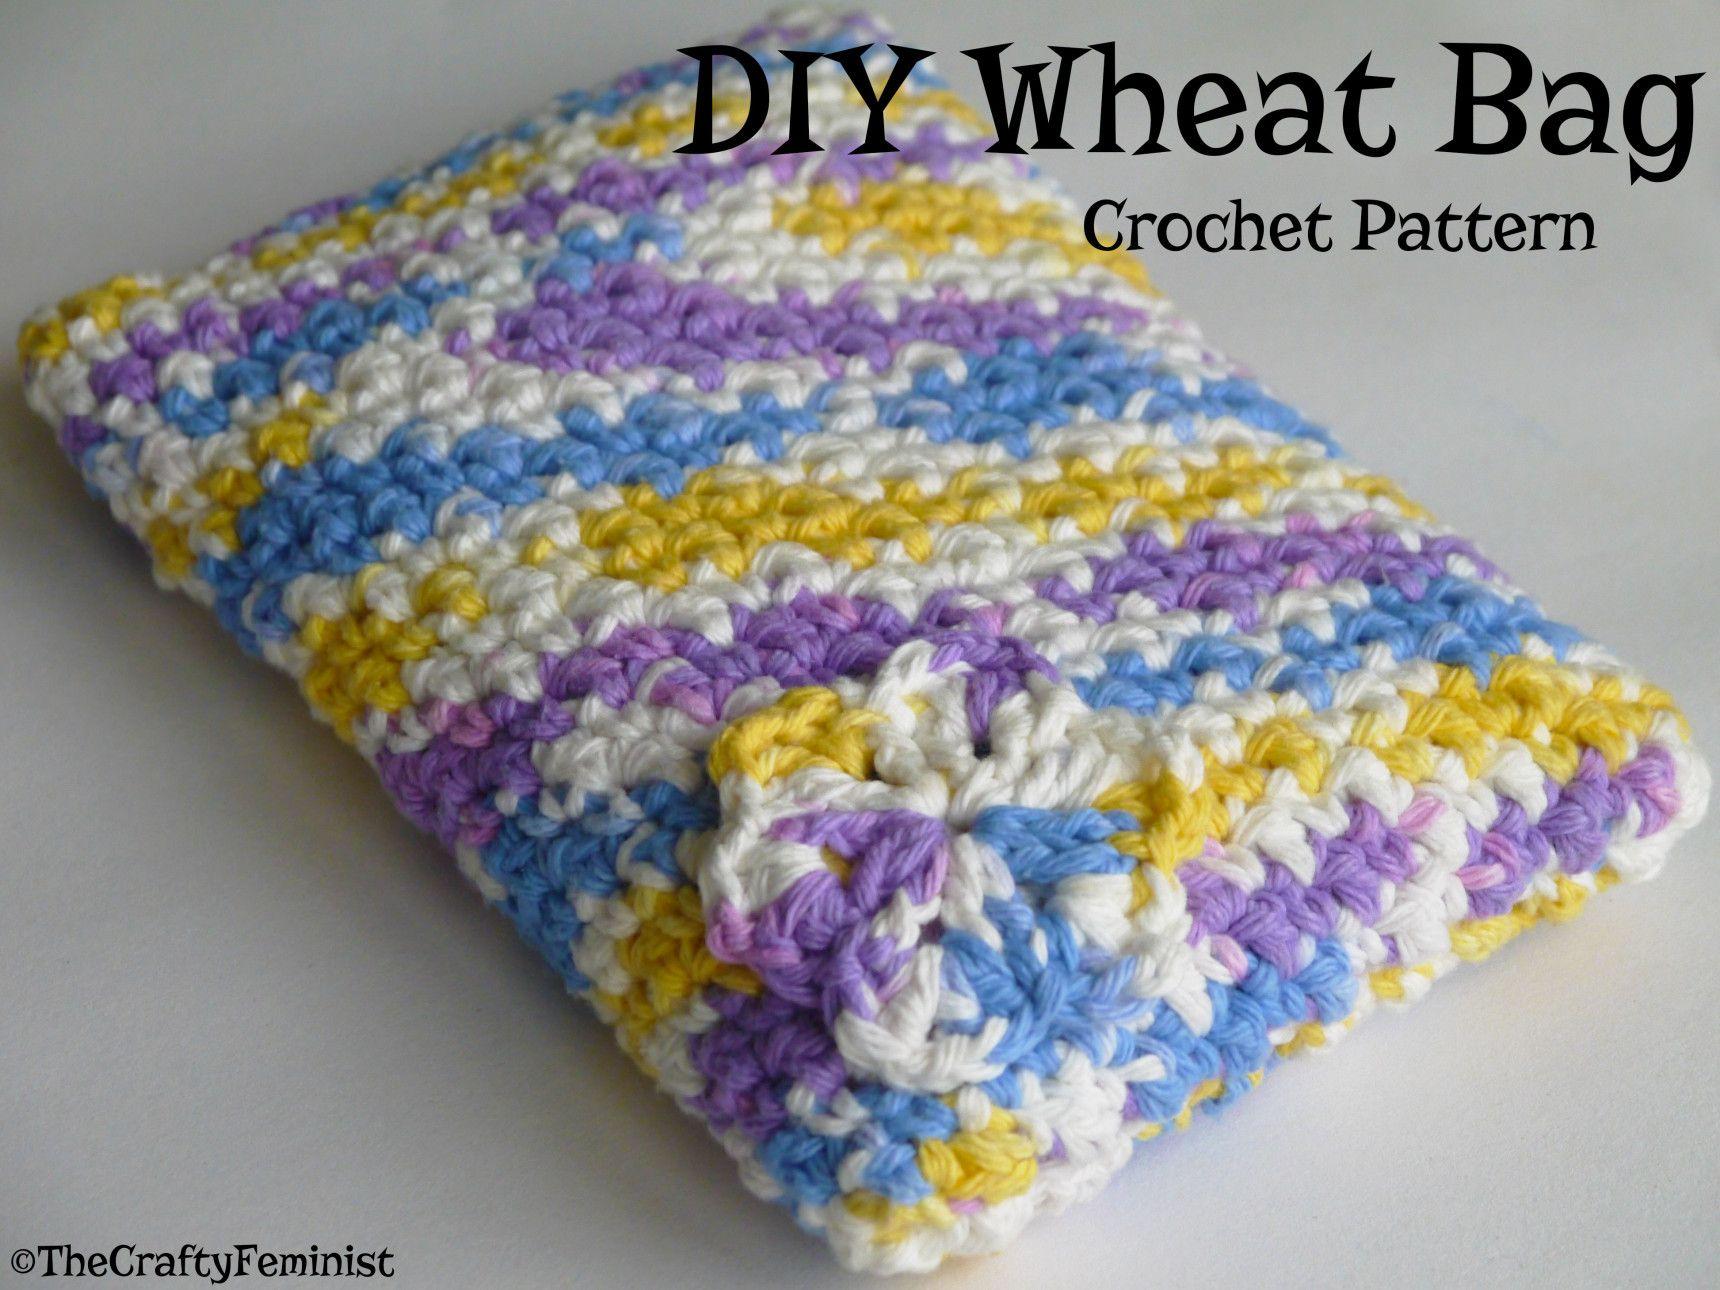 Crochet rice bag cover free pattern crochet pinterest rice crochet rice bag cover free pattern bankloansurffo Gallery